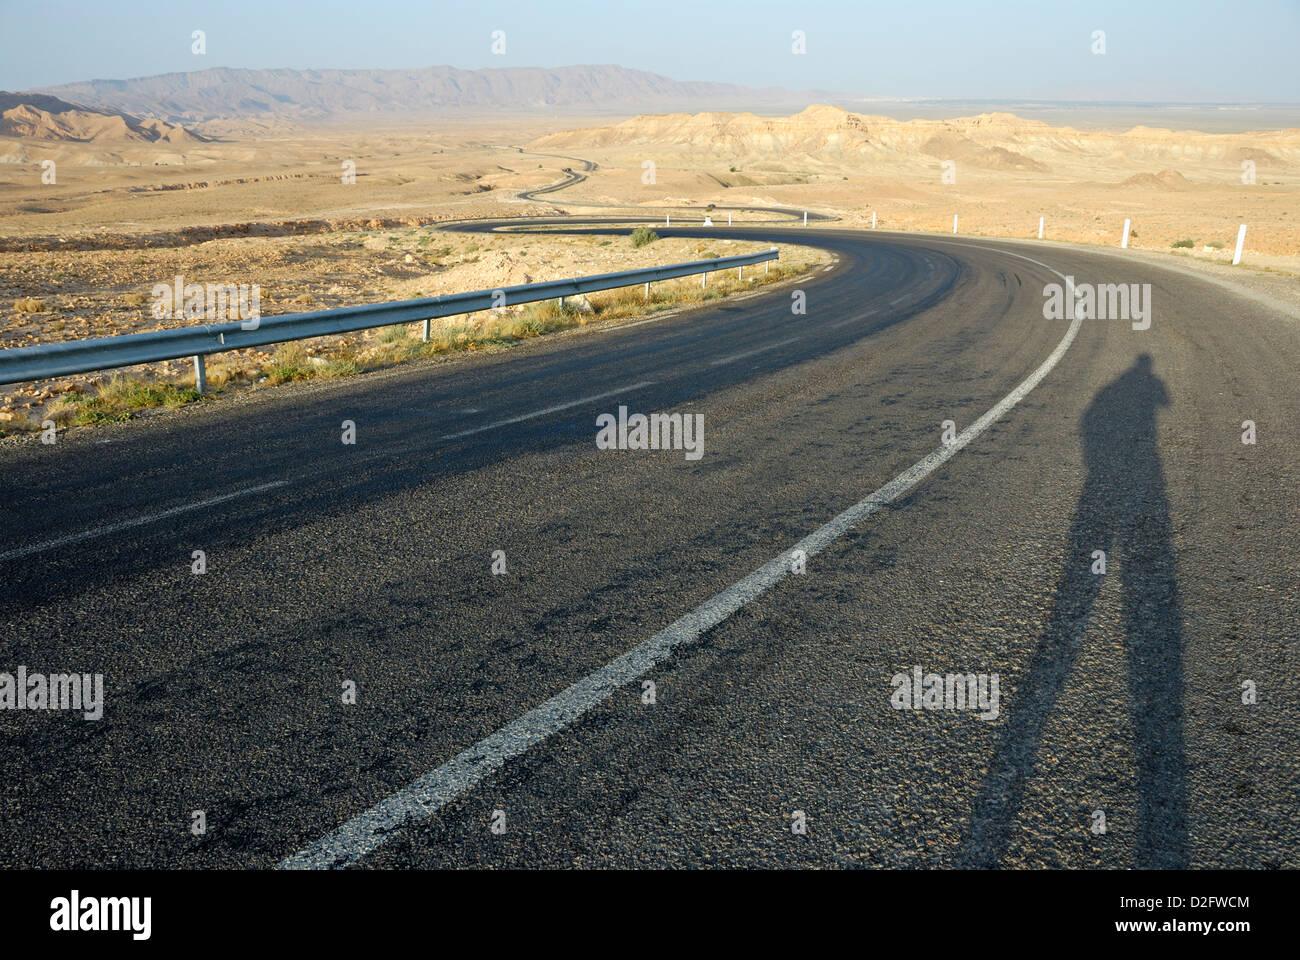 Man's shadow on a empty winding desert road, Tunisia Stock Photo